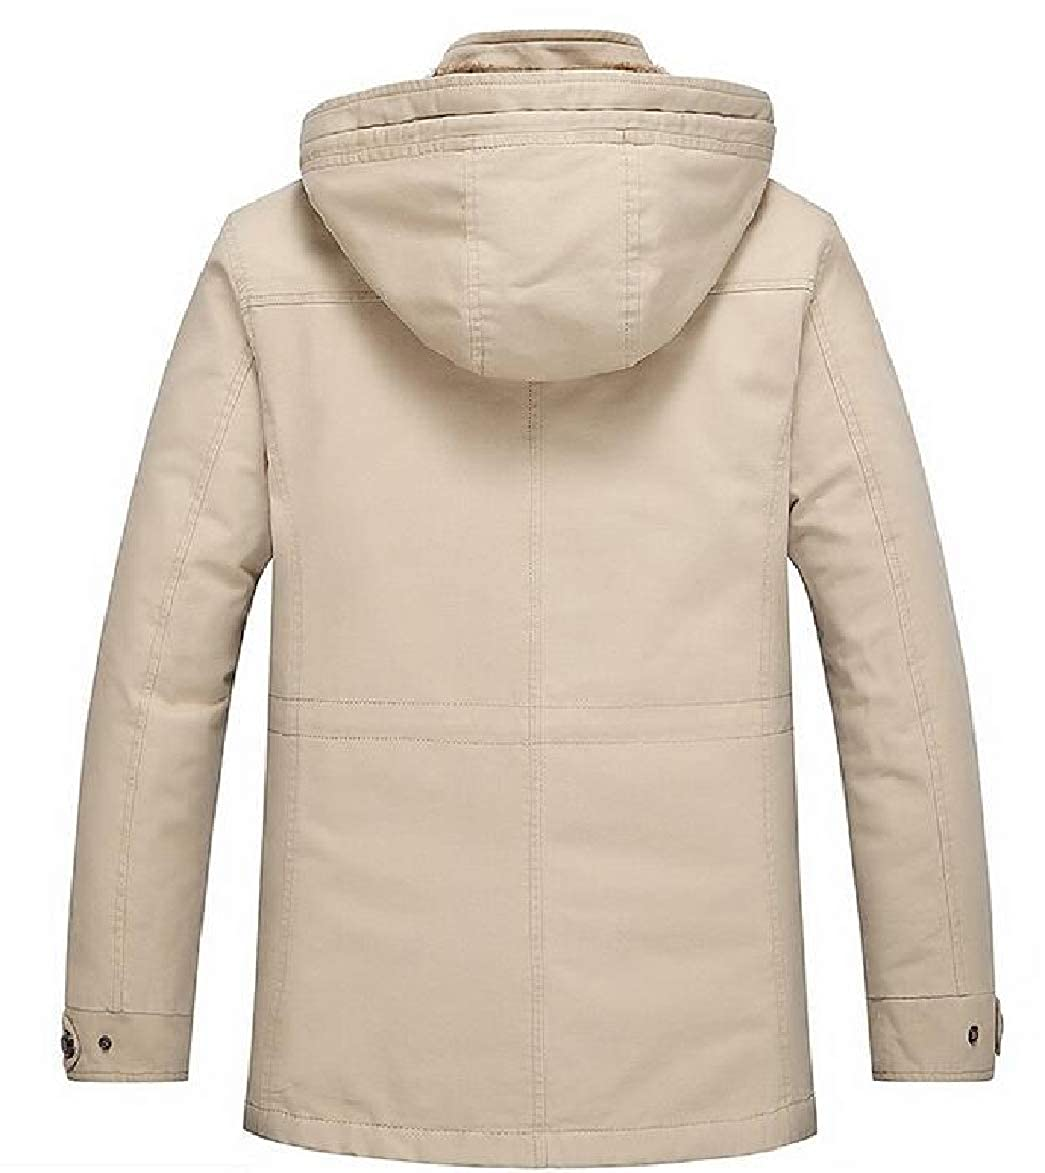 RRINSINS Mens Outdoor Mid Long Warm Hooded Oversize Swearshirt Jacket